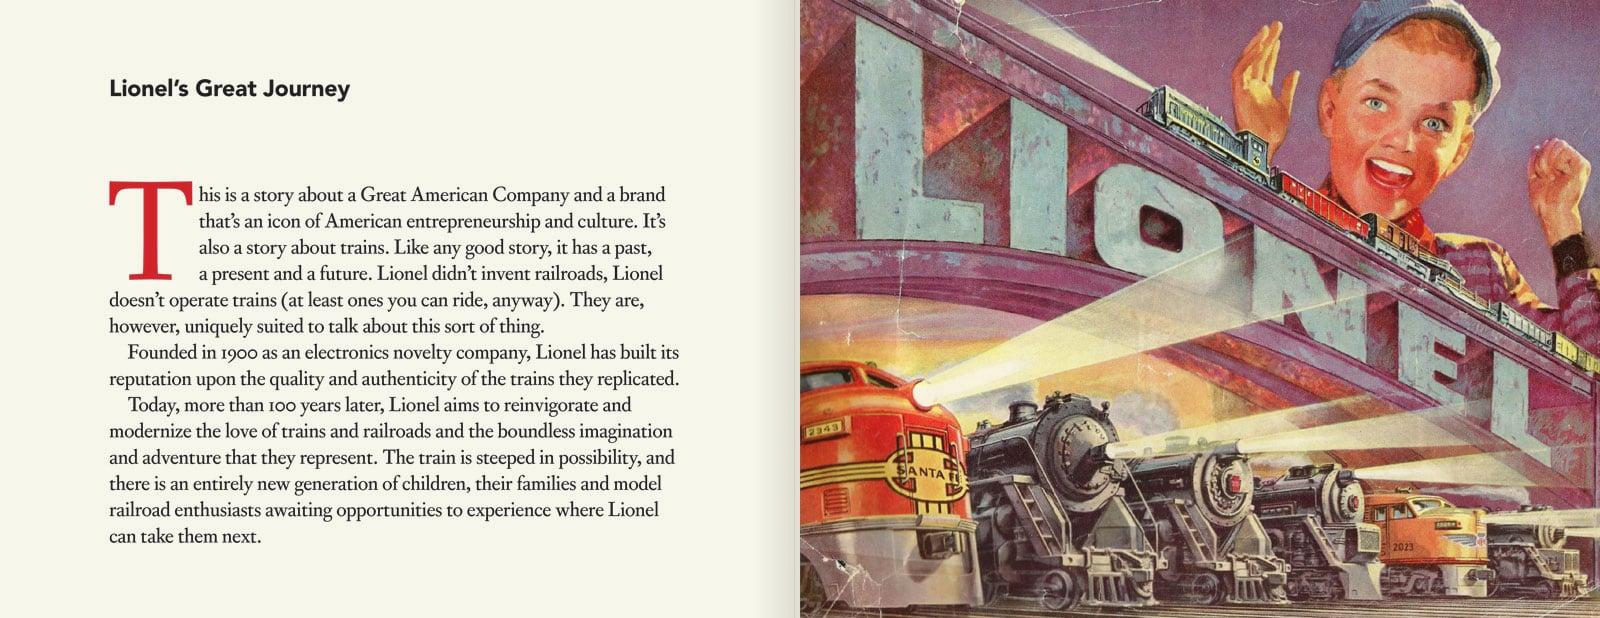 1-Lionel_Book-journey.jpg